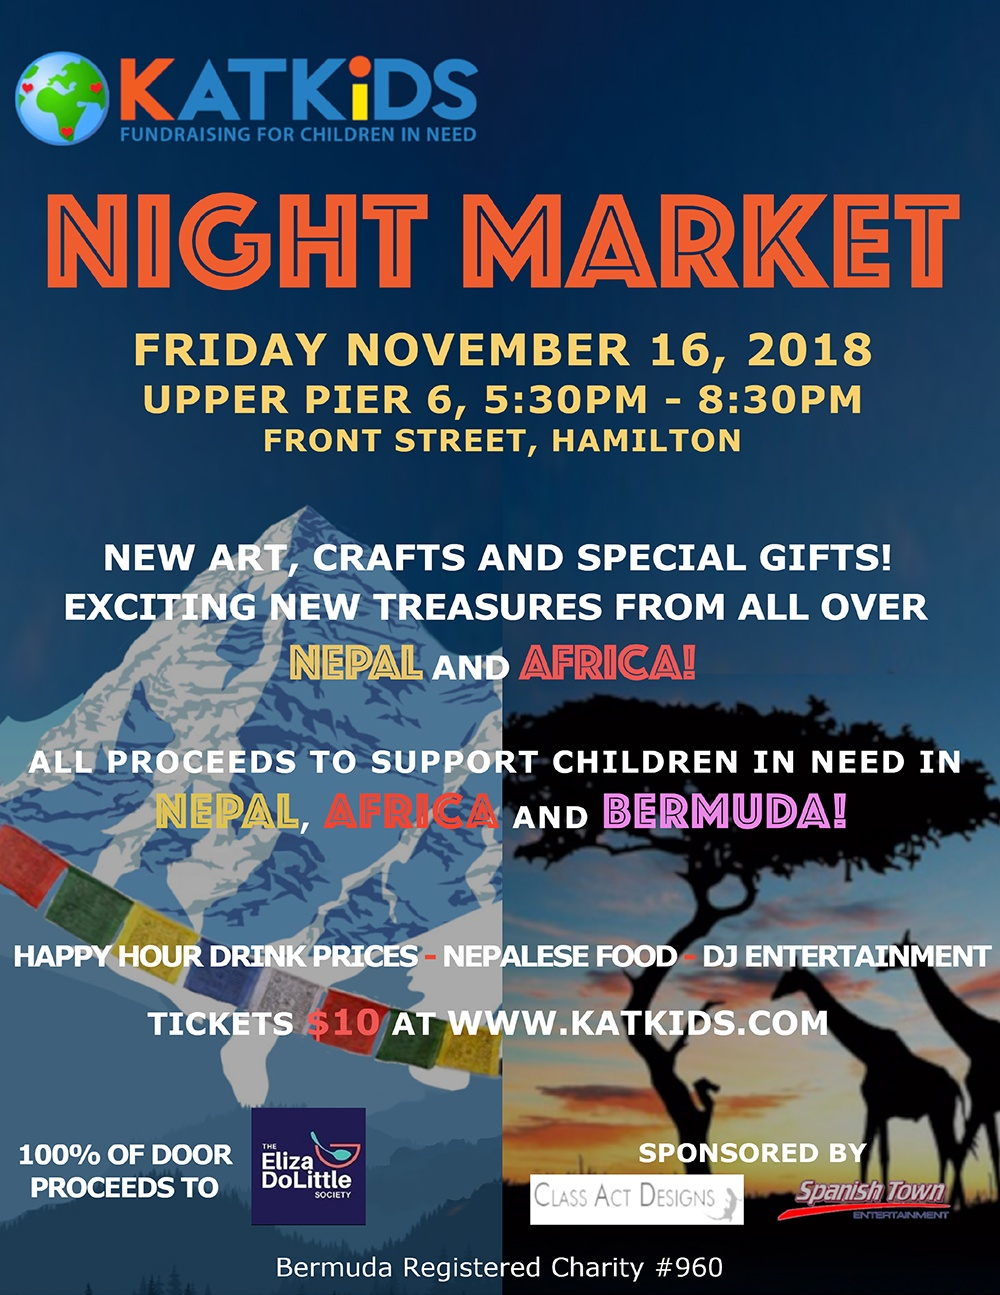 KATKiDS Night Market Bermuda Nov 15 2018